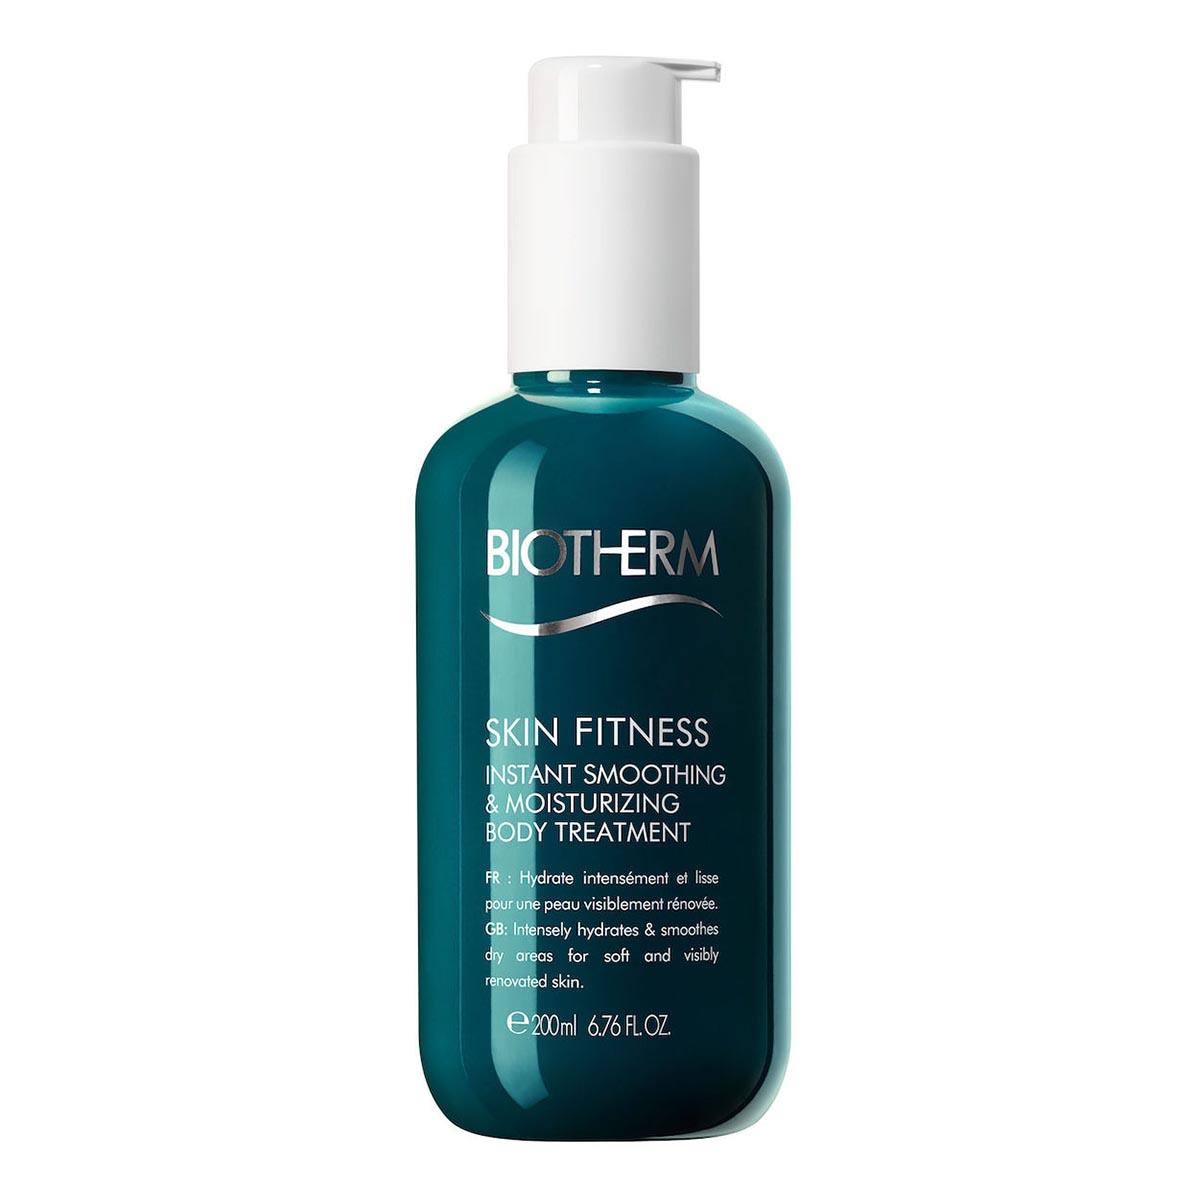 Biotherm skin fitness instant smoothing moisturizing body treatment 200ml